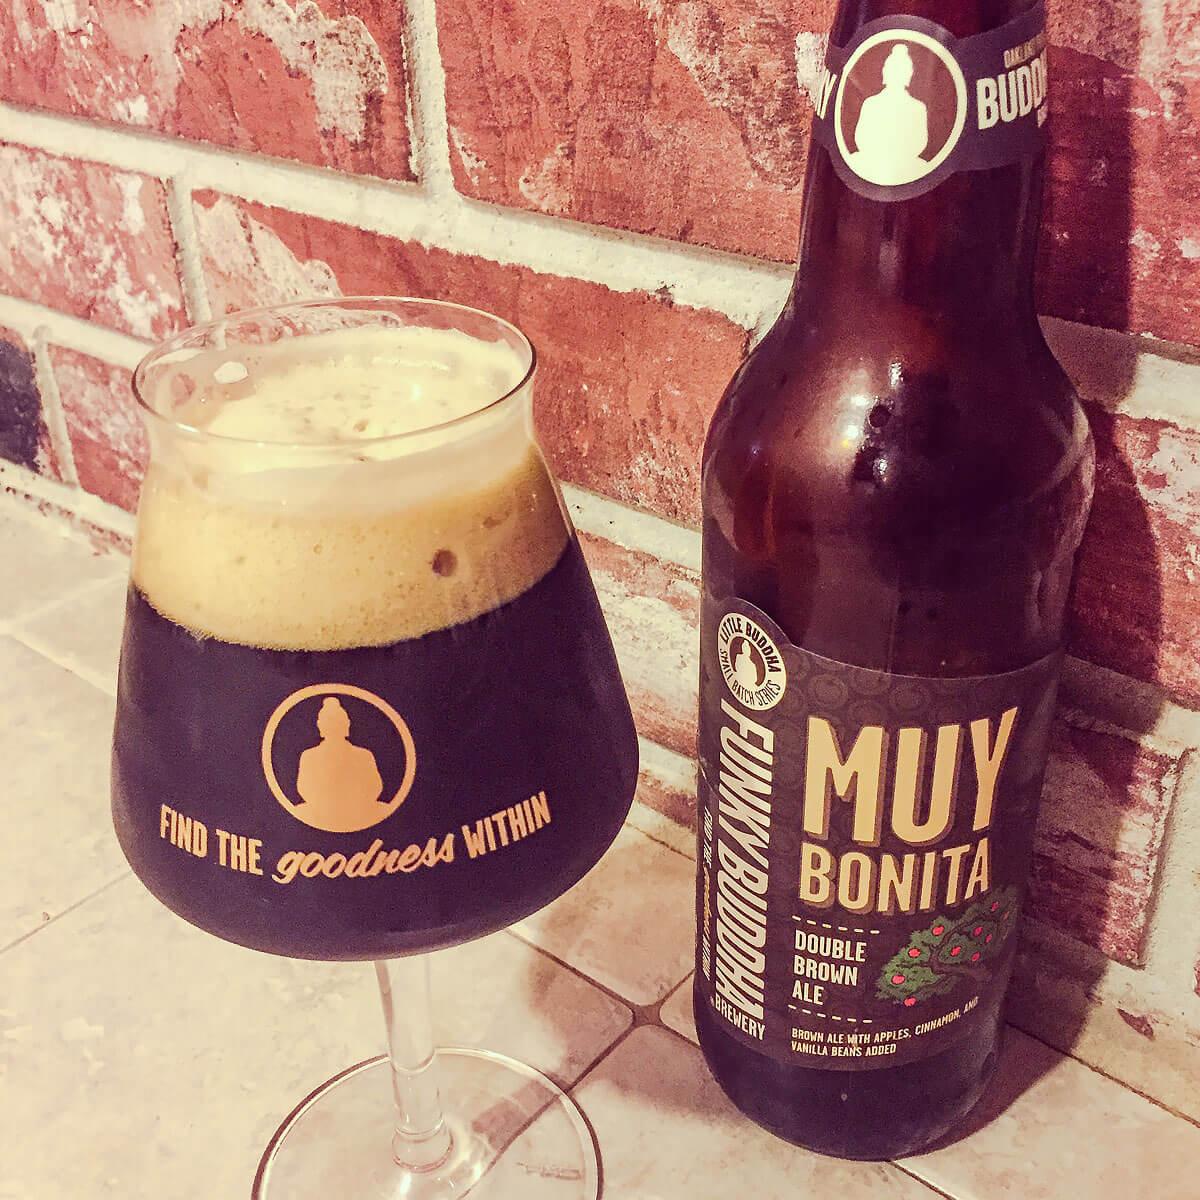 Muy Bonita, an American Brown Ale by Funky Buddha Brewery